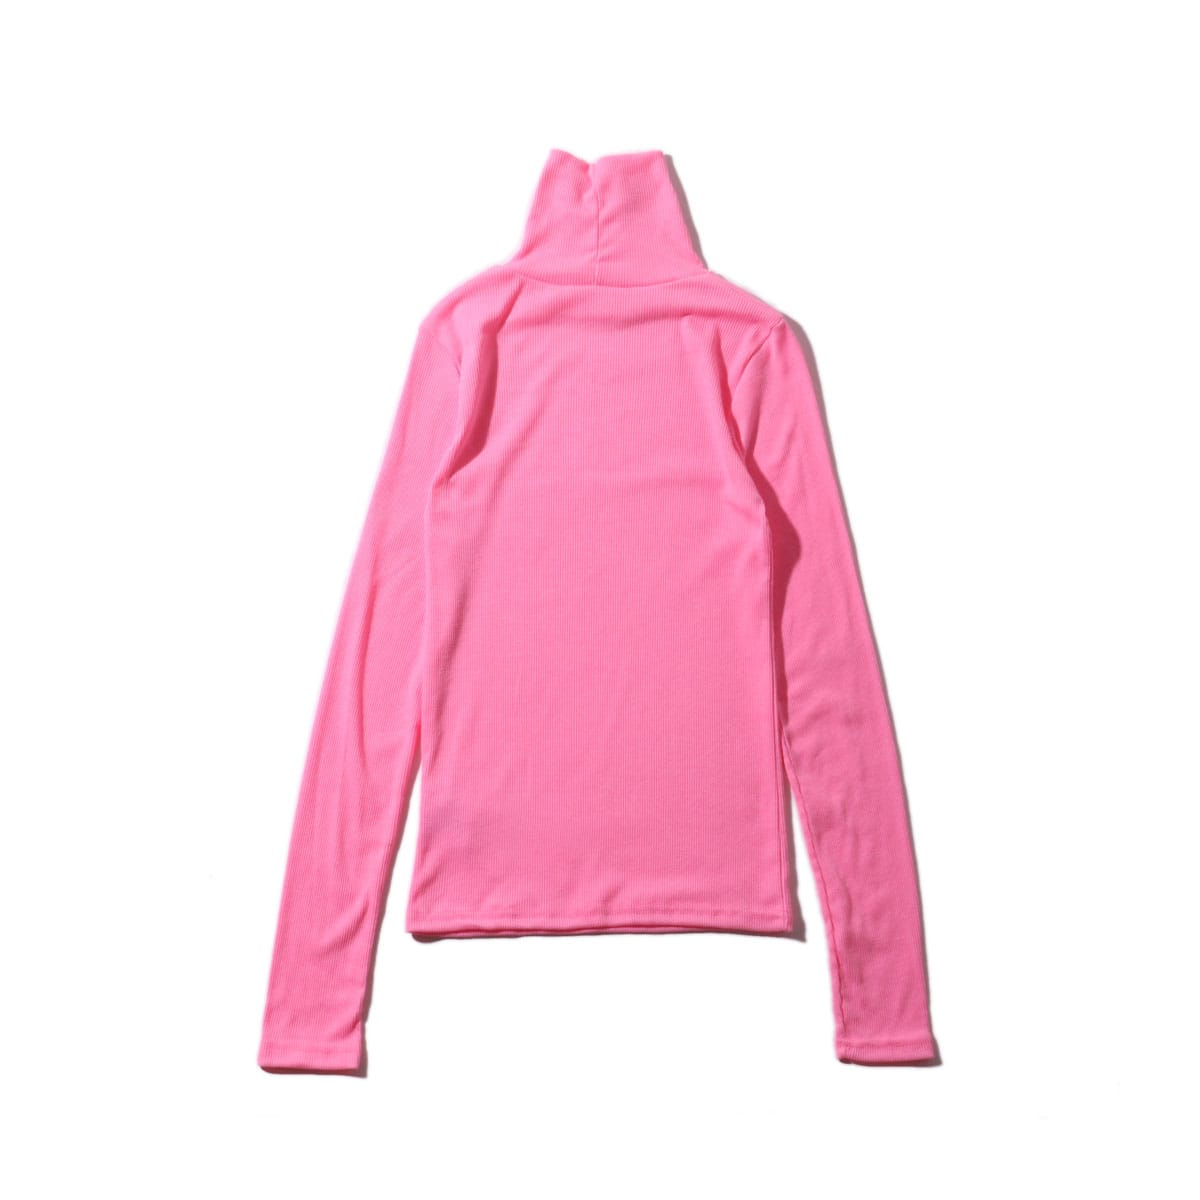 """atmos pink カラフル タートルネック PINK 19SP-I""_photo_3"